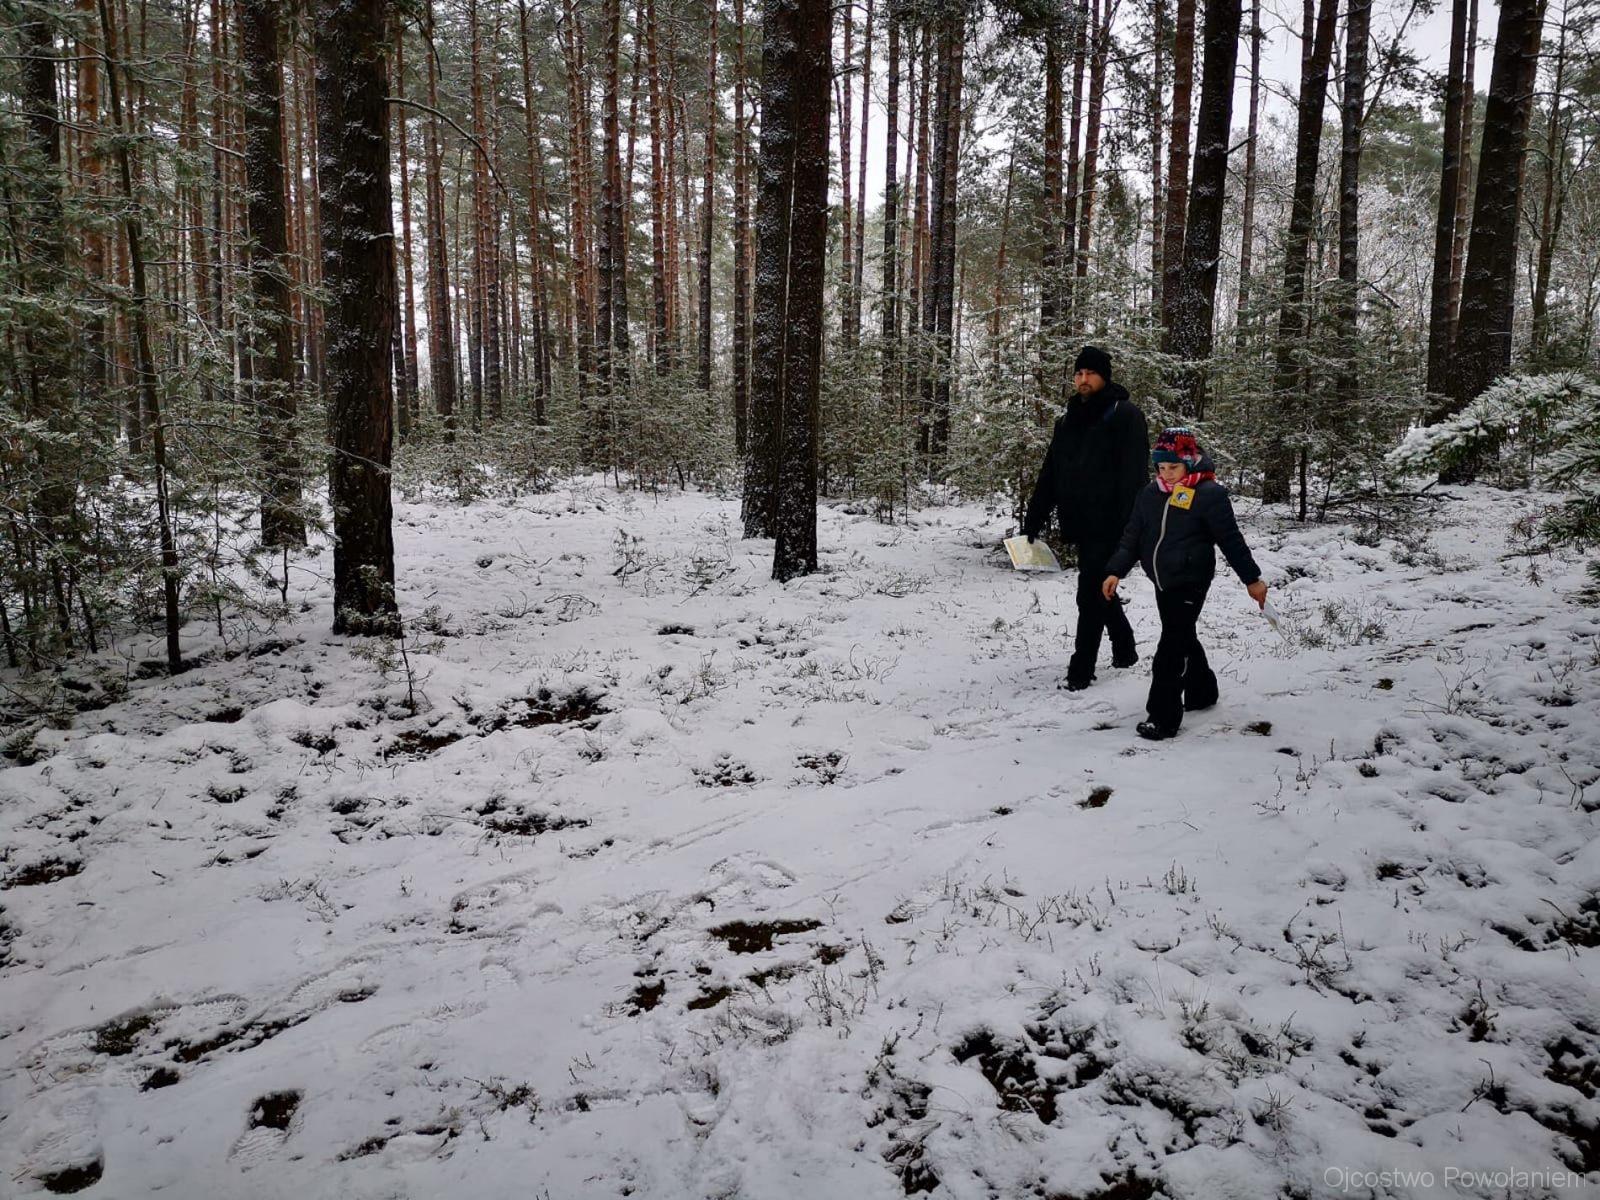 podchody-zima-2021-6